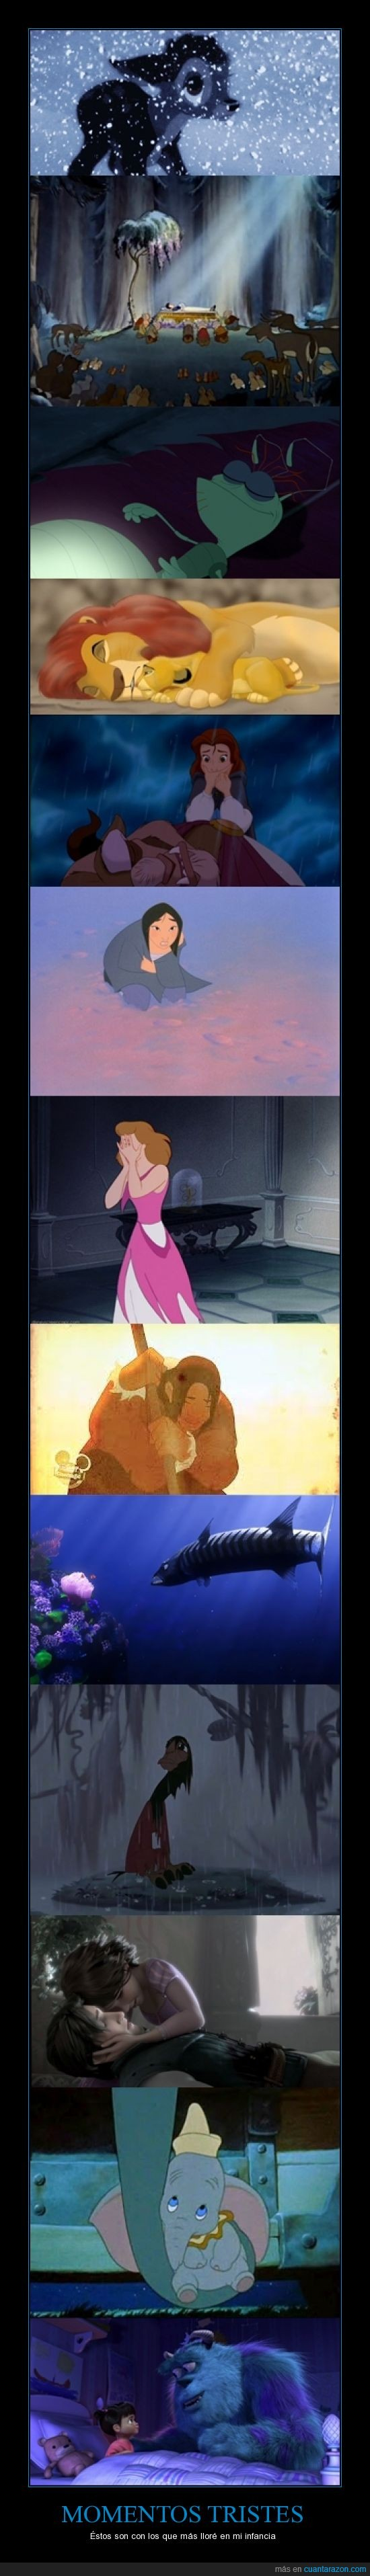 bambi,bella y la bestia,cenicienta,disney,dumbo,llorar,monstruos,mulan,rapunzel,rey leon,simba,triste,zas